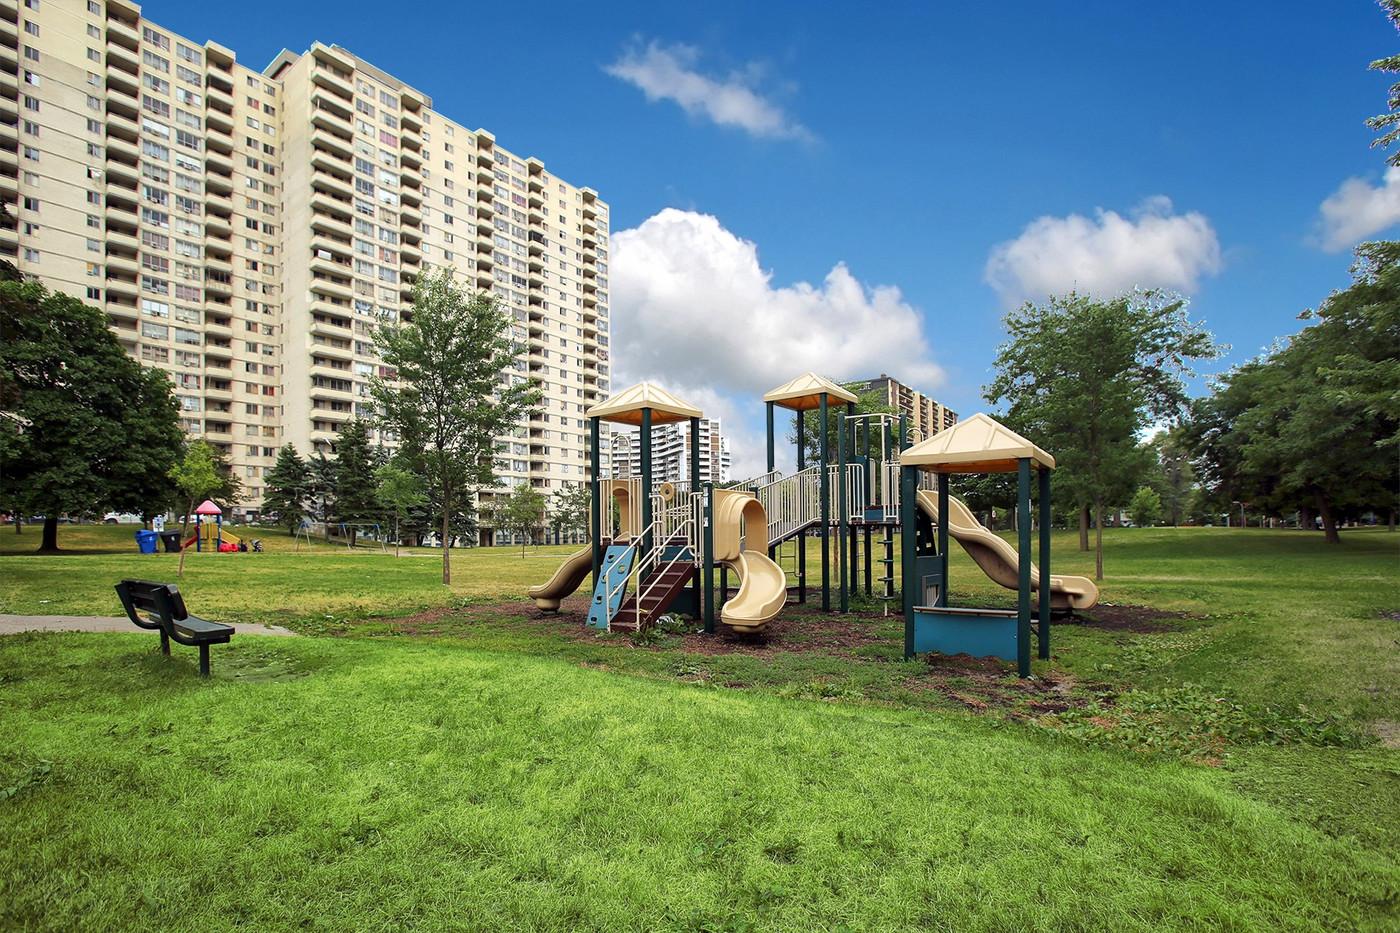 Exterior Back Playground.jpg